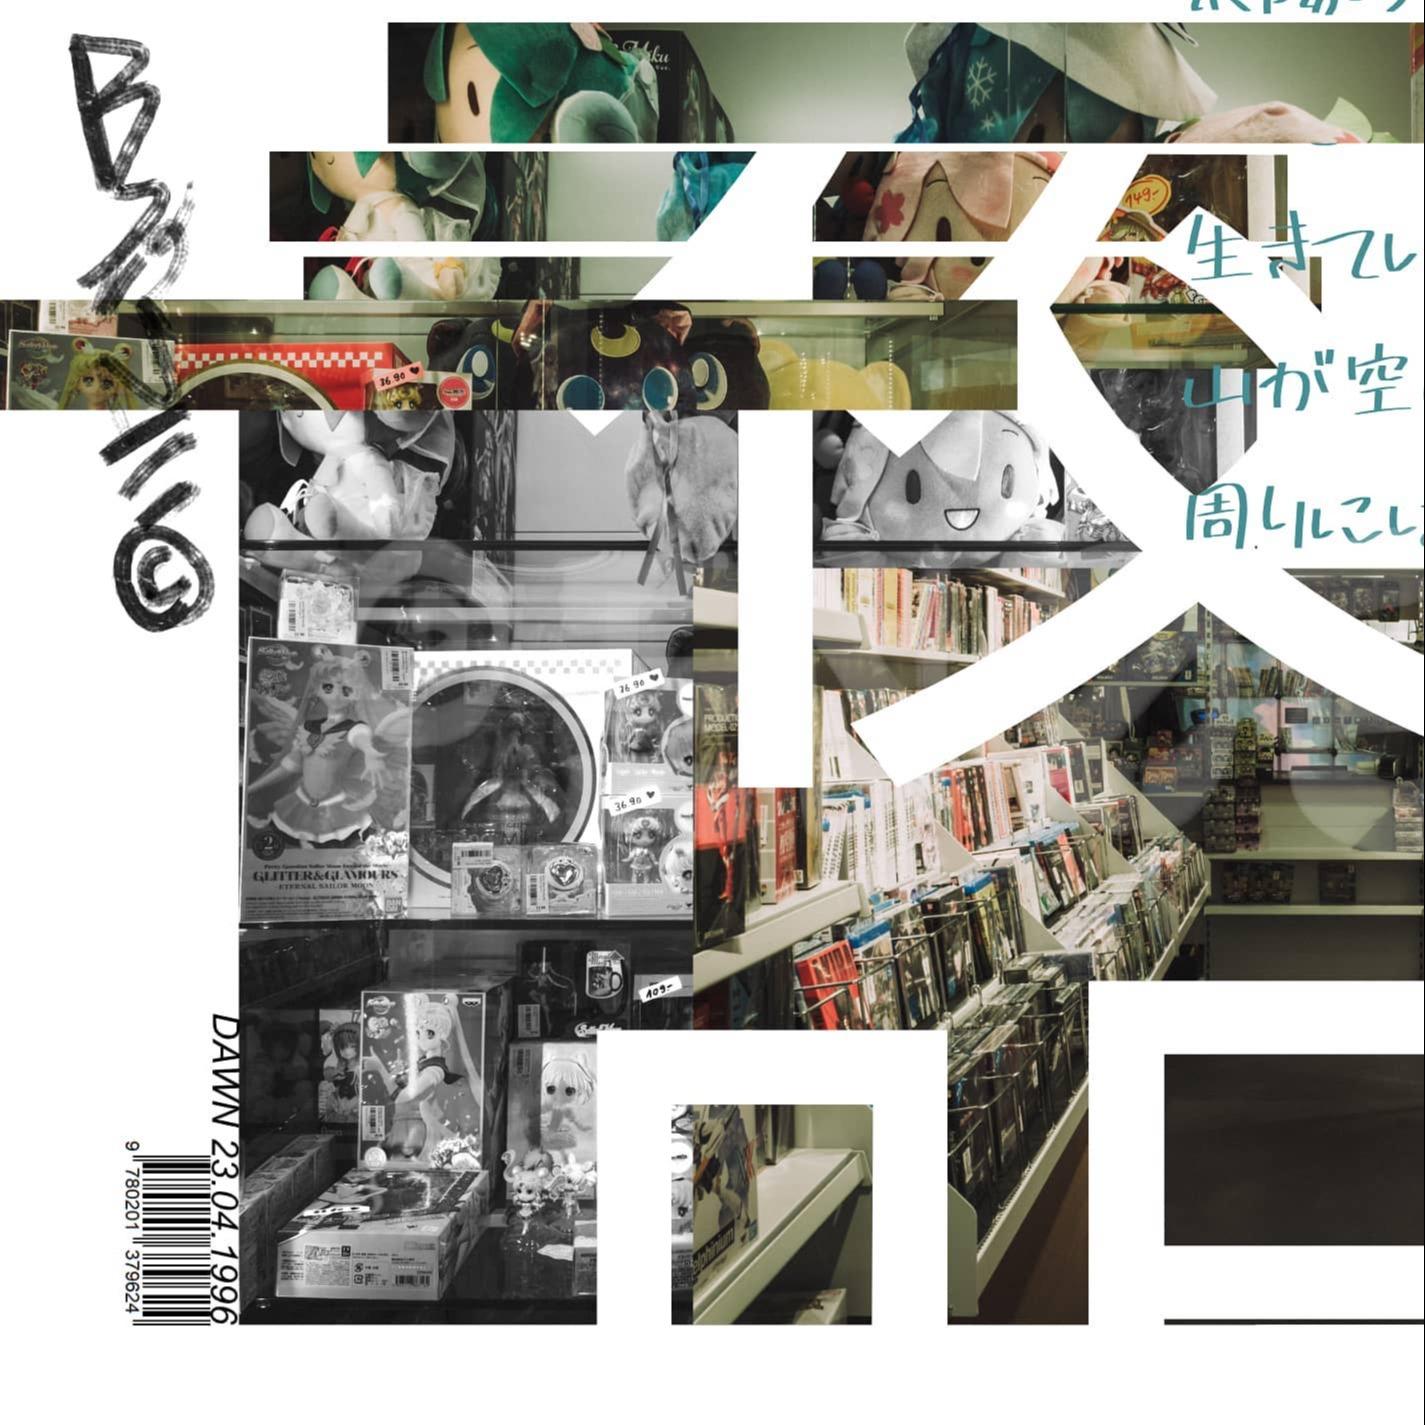 BØNE Spotify: DAWN 23.04.1996 Link Thumbnail | Linktree